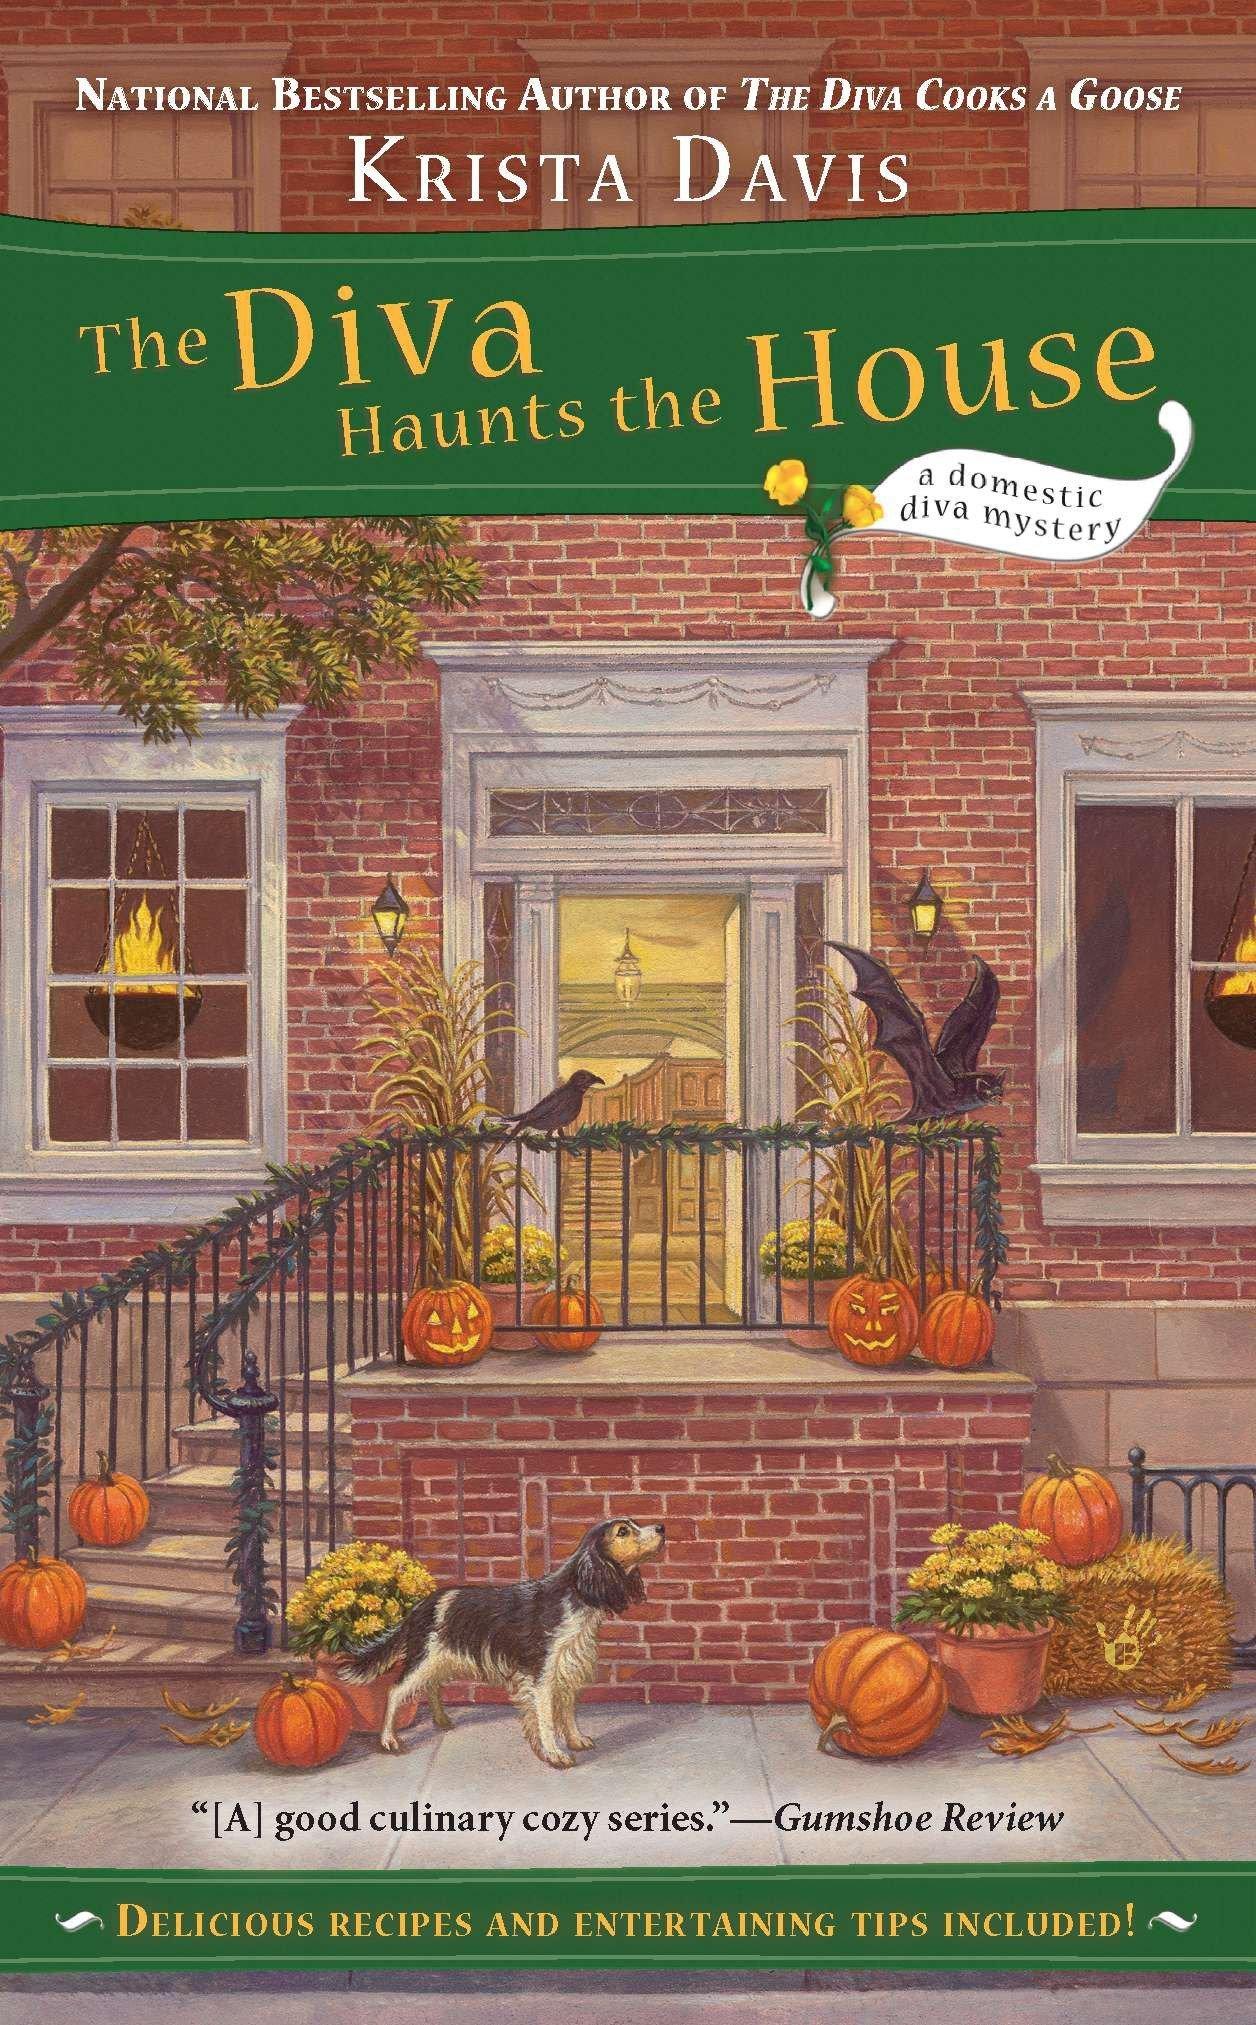 The Diva Haunts the House (A Domestic Diva Mystery) ebook